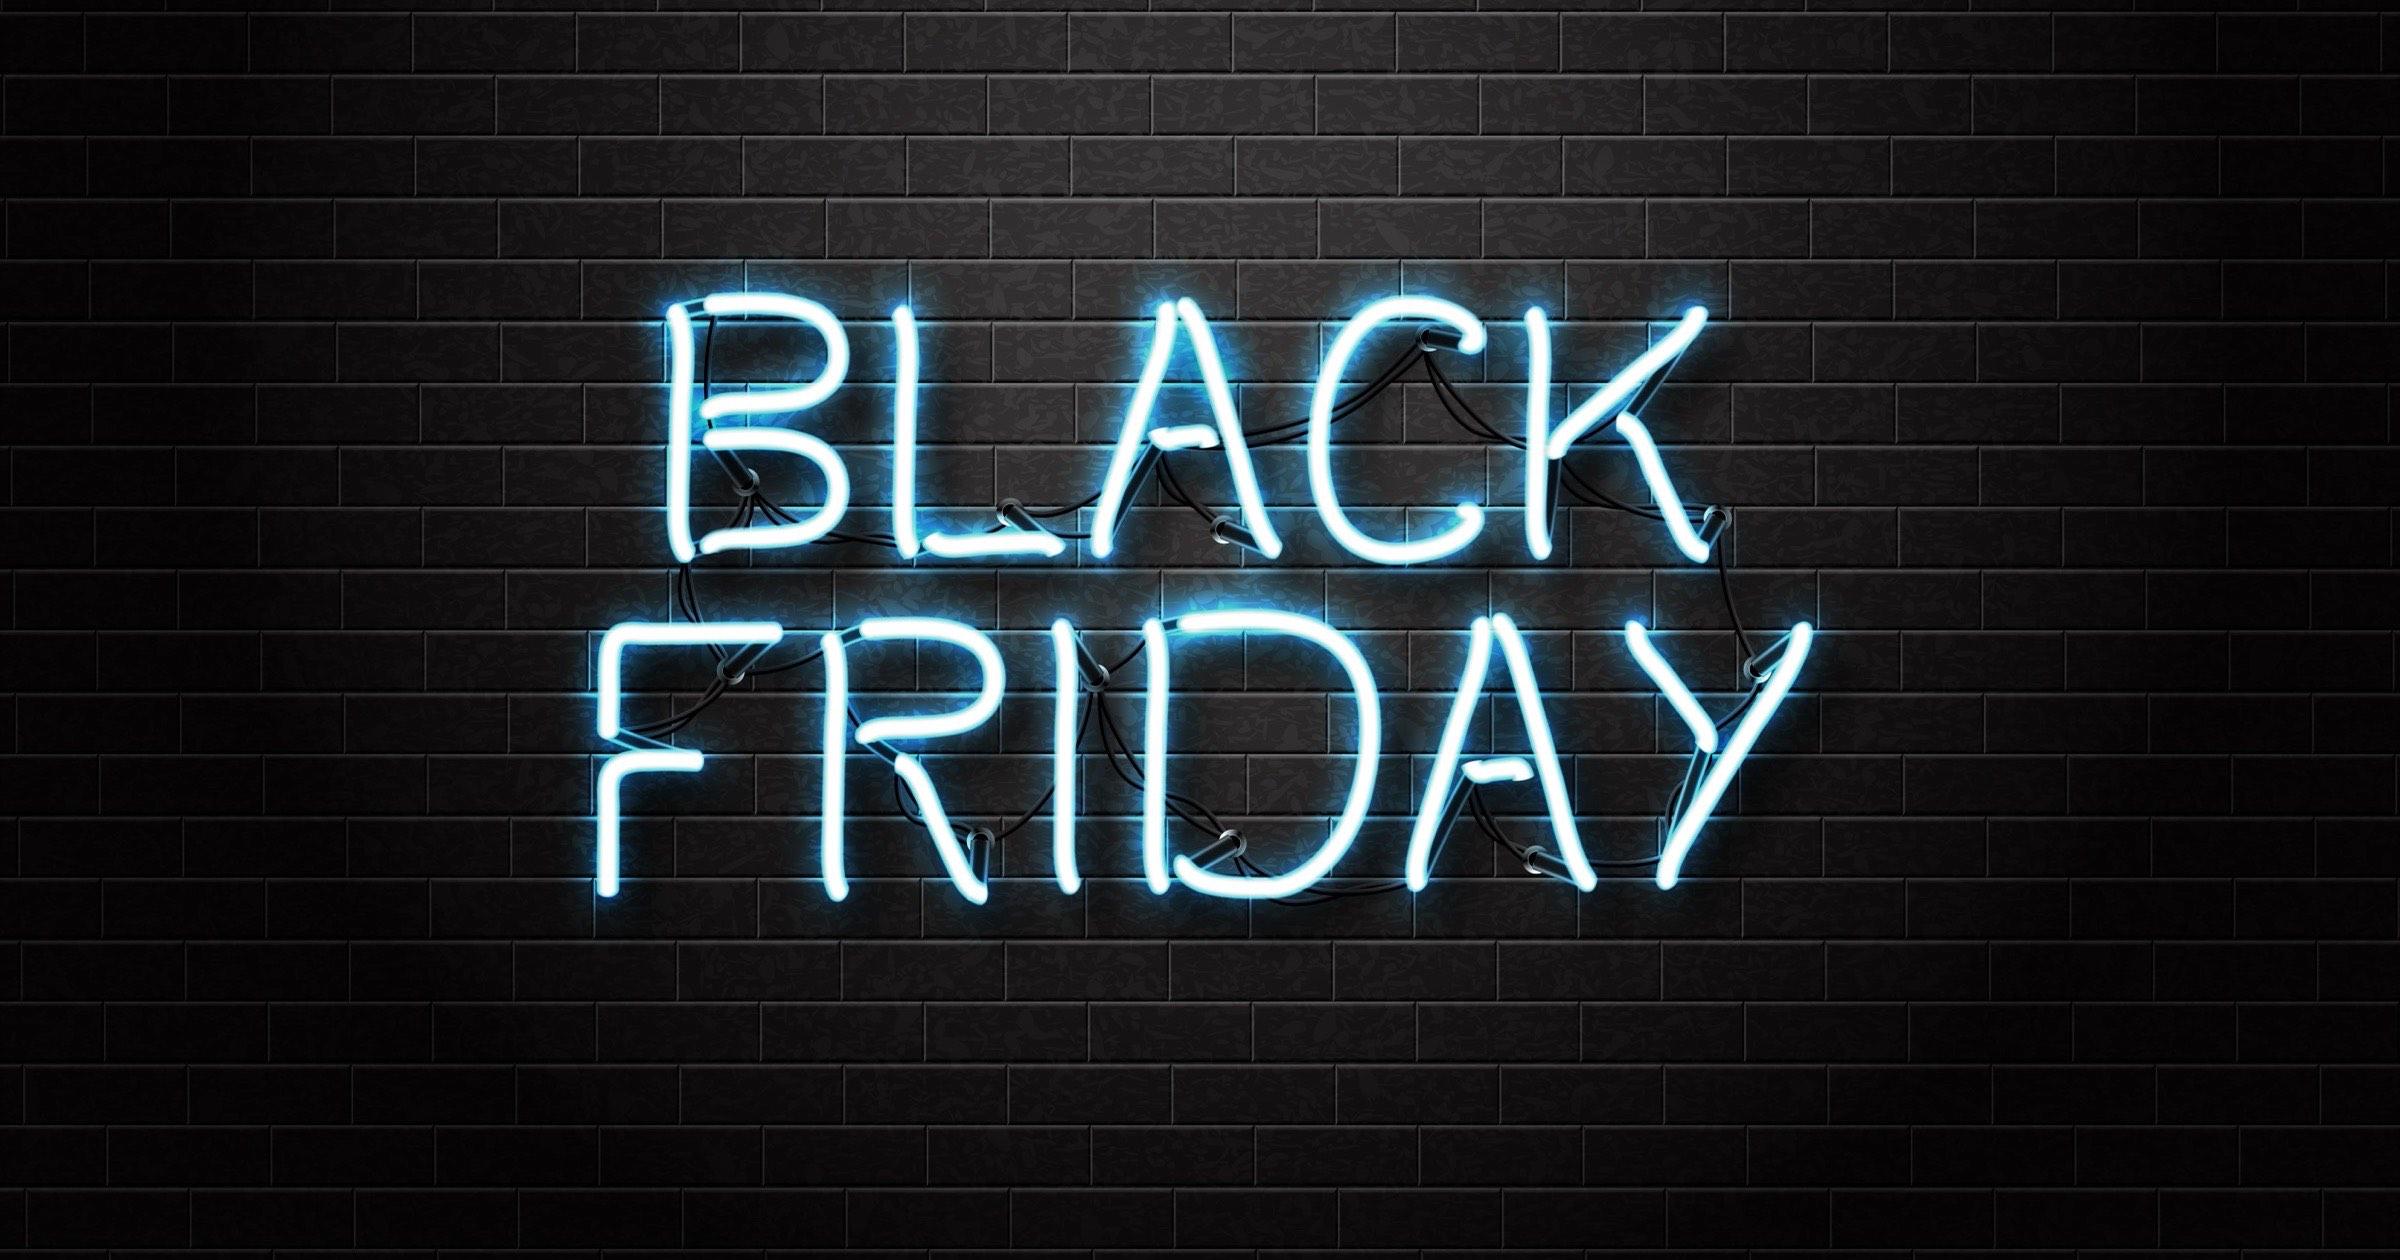 Black Friday text on black brick background.